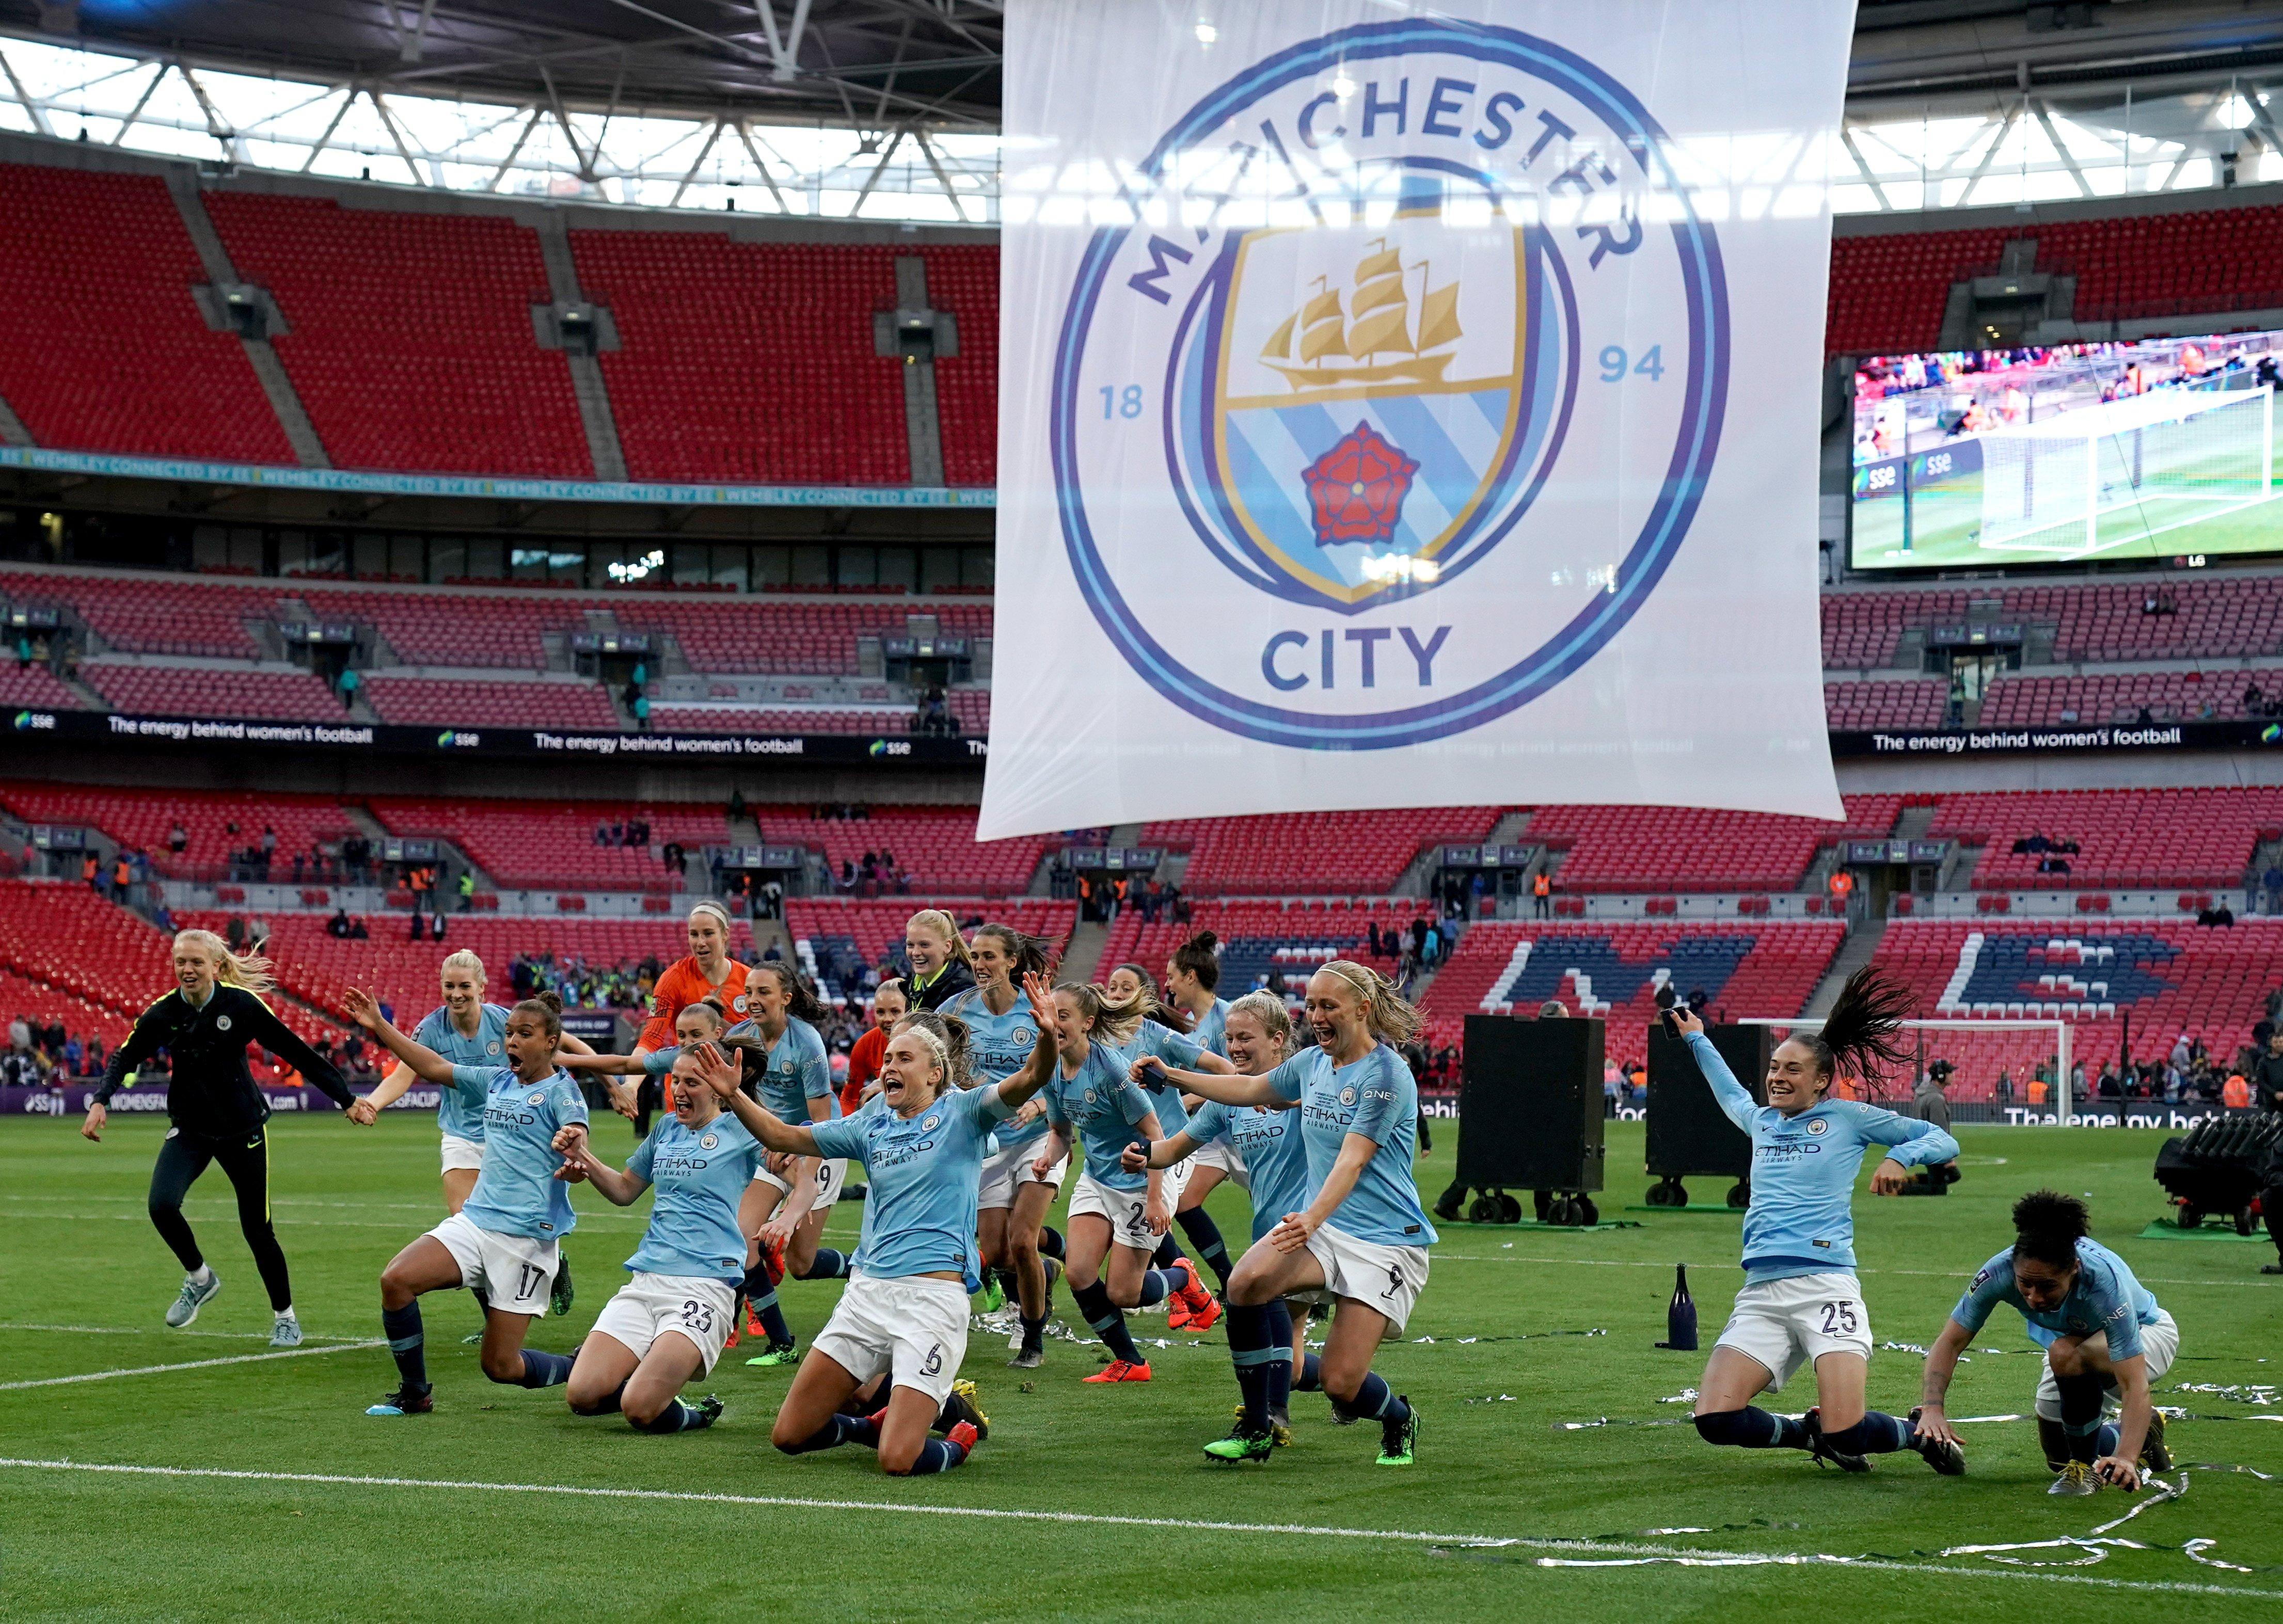 Women's super league (WSL) - cover